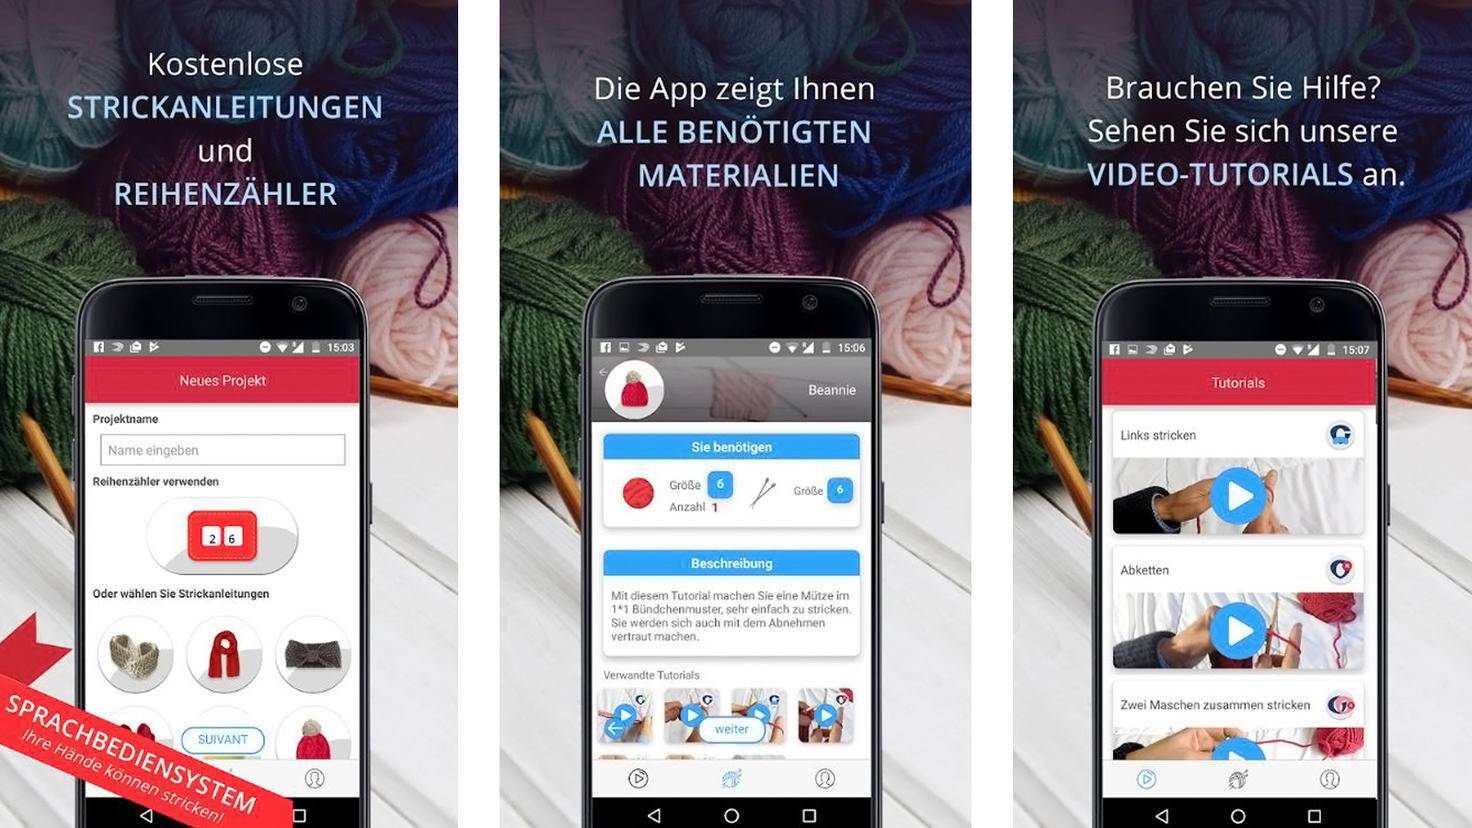 Strick Mich-Google Play Store-Annapurnapp Technologies